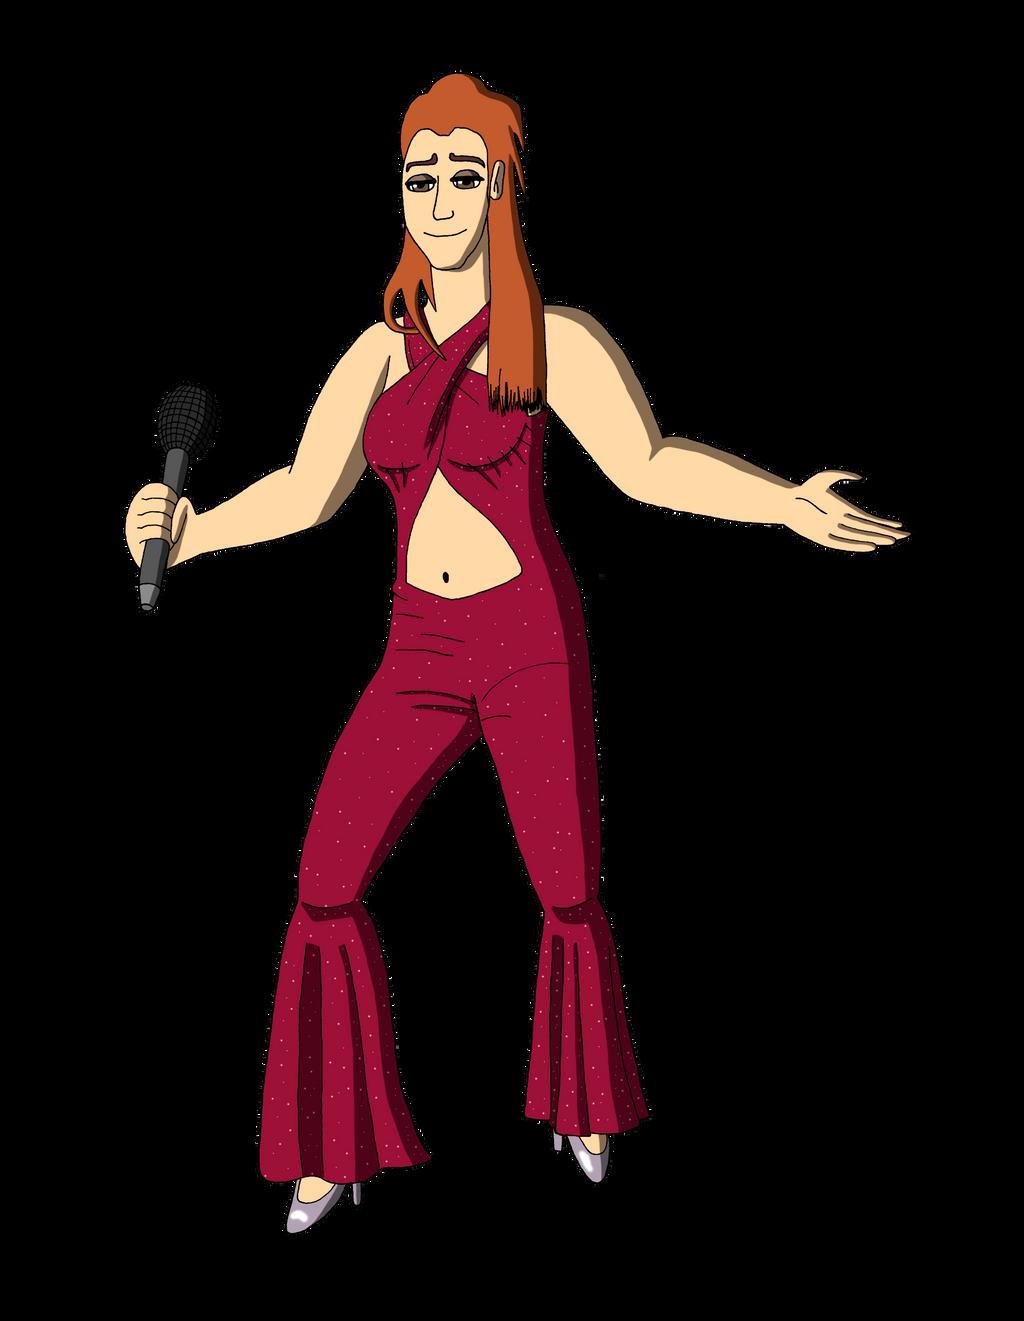 Jessica Espinoza As Selena Quintanilla Perez By Renthegodofhumor On Deviantart